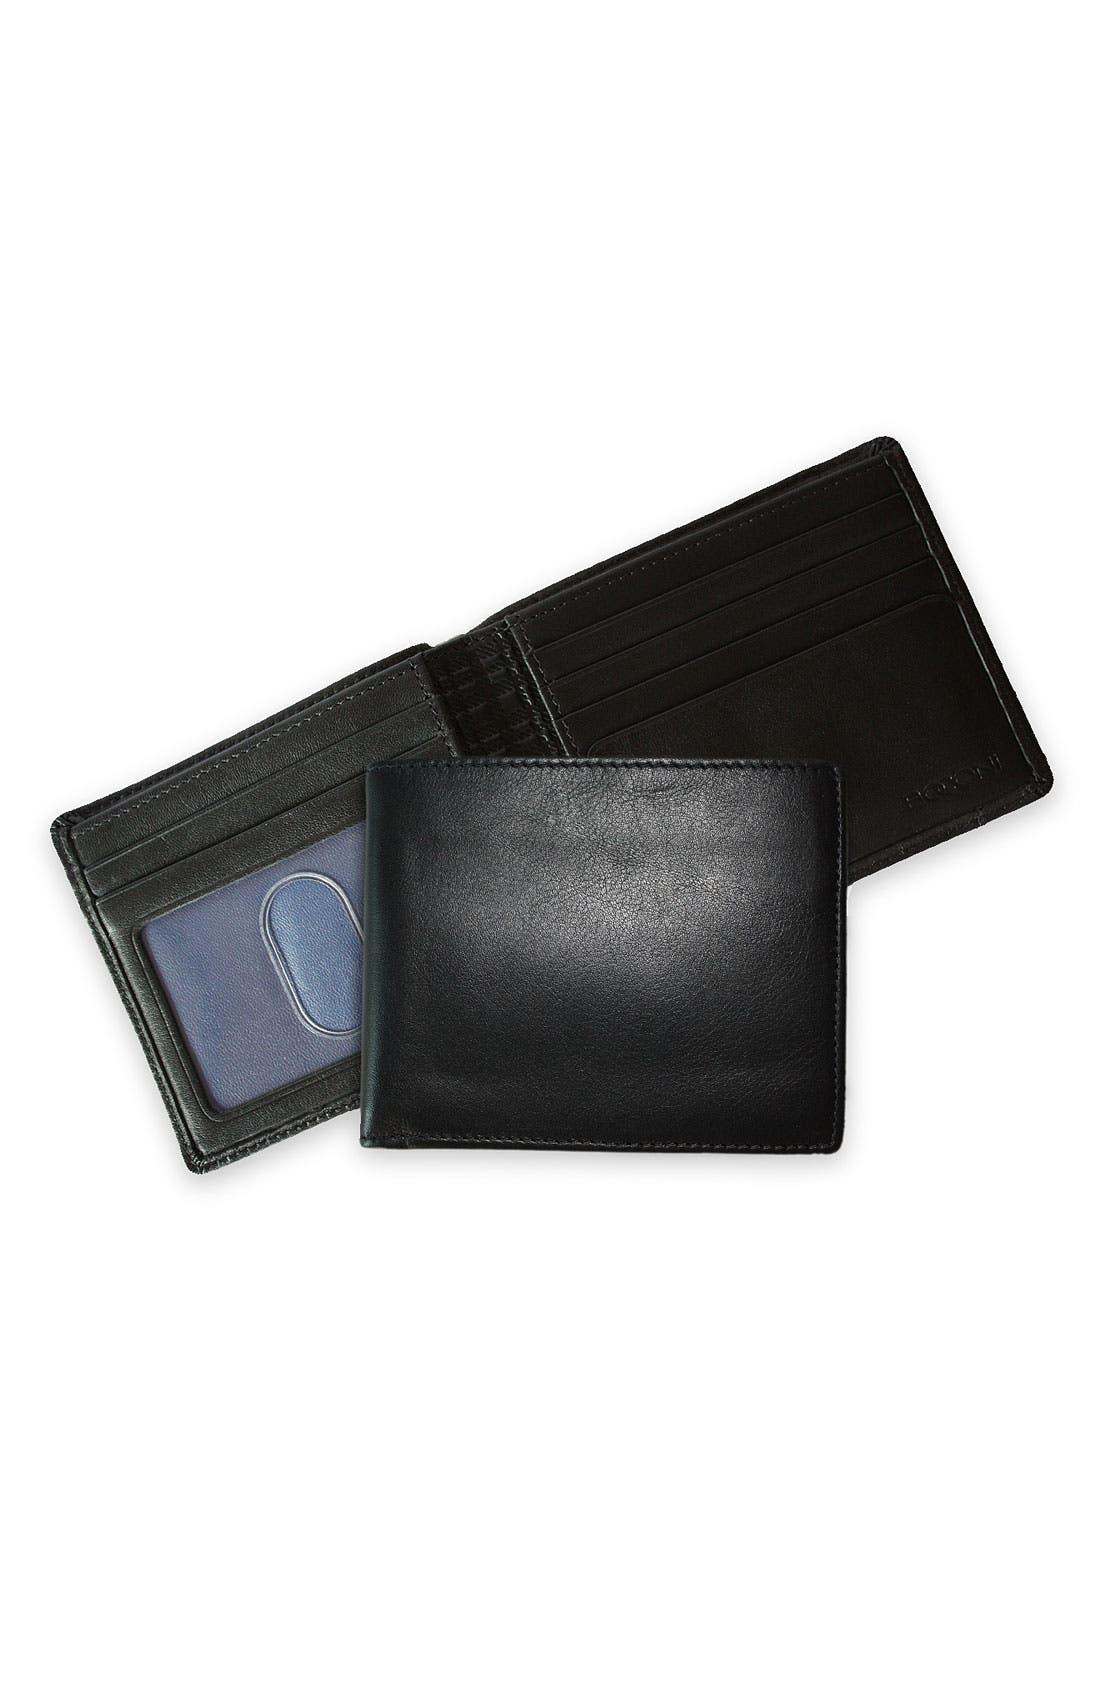 Alternate Image 1 Selected - Boconi Leather Billfold